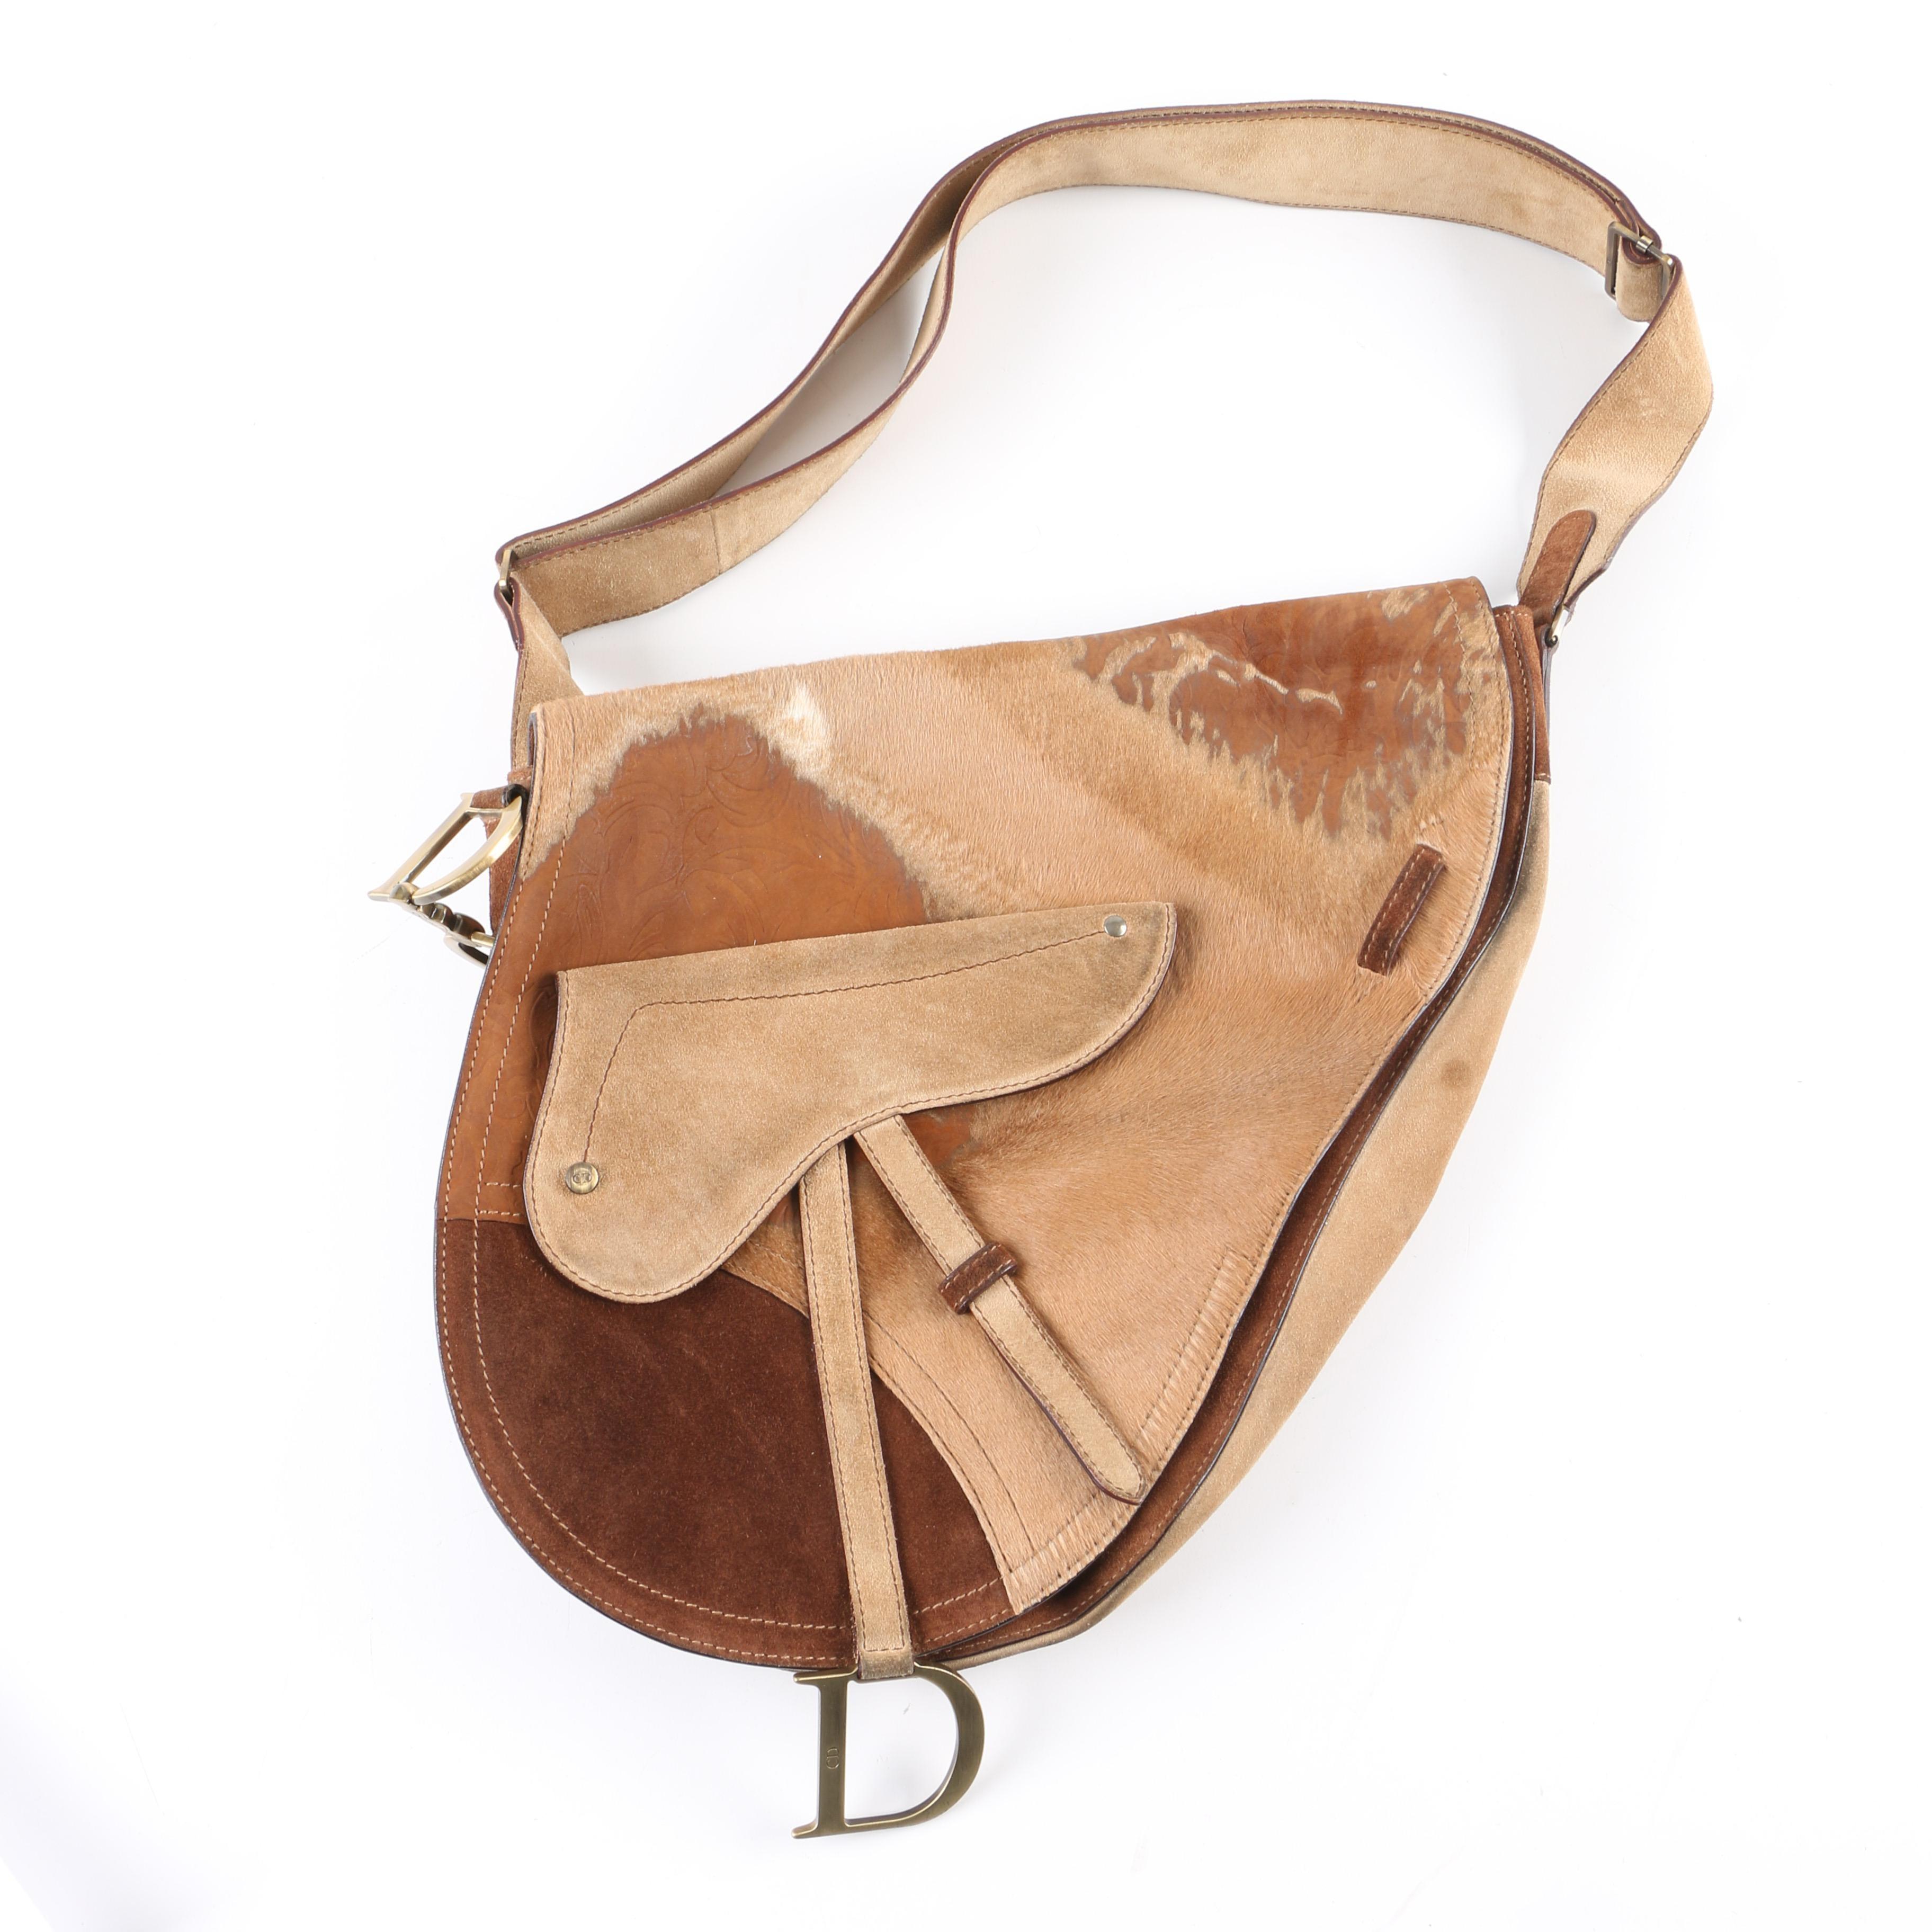 Christian Dior Suede and Calf Hair Saddle Handbag